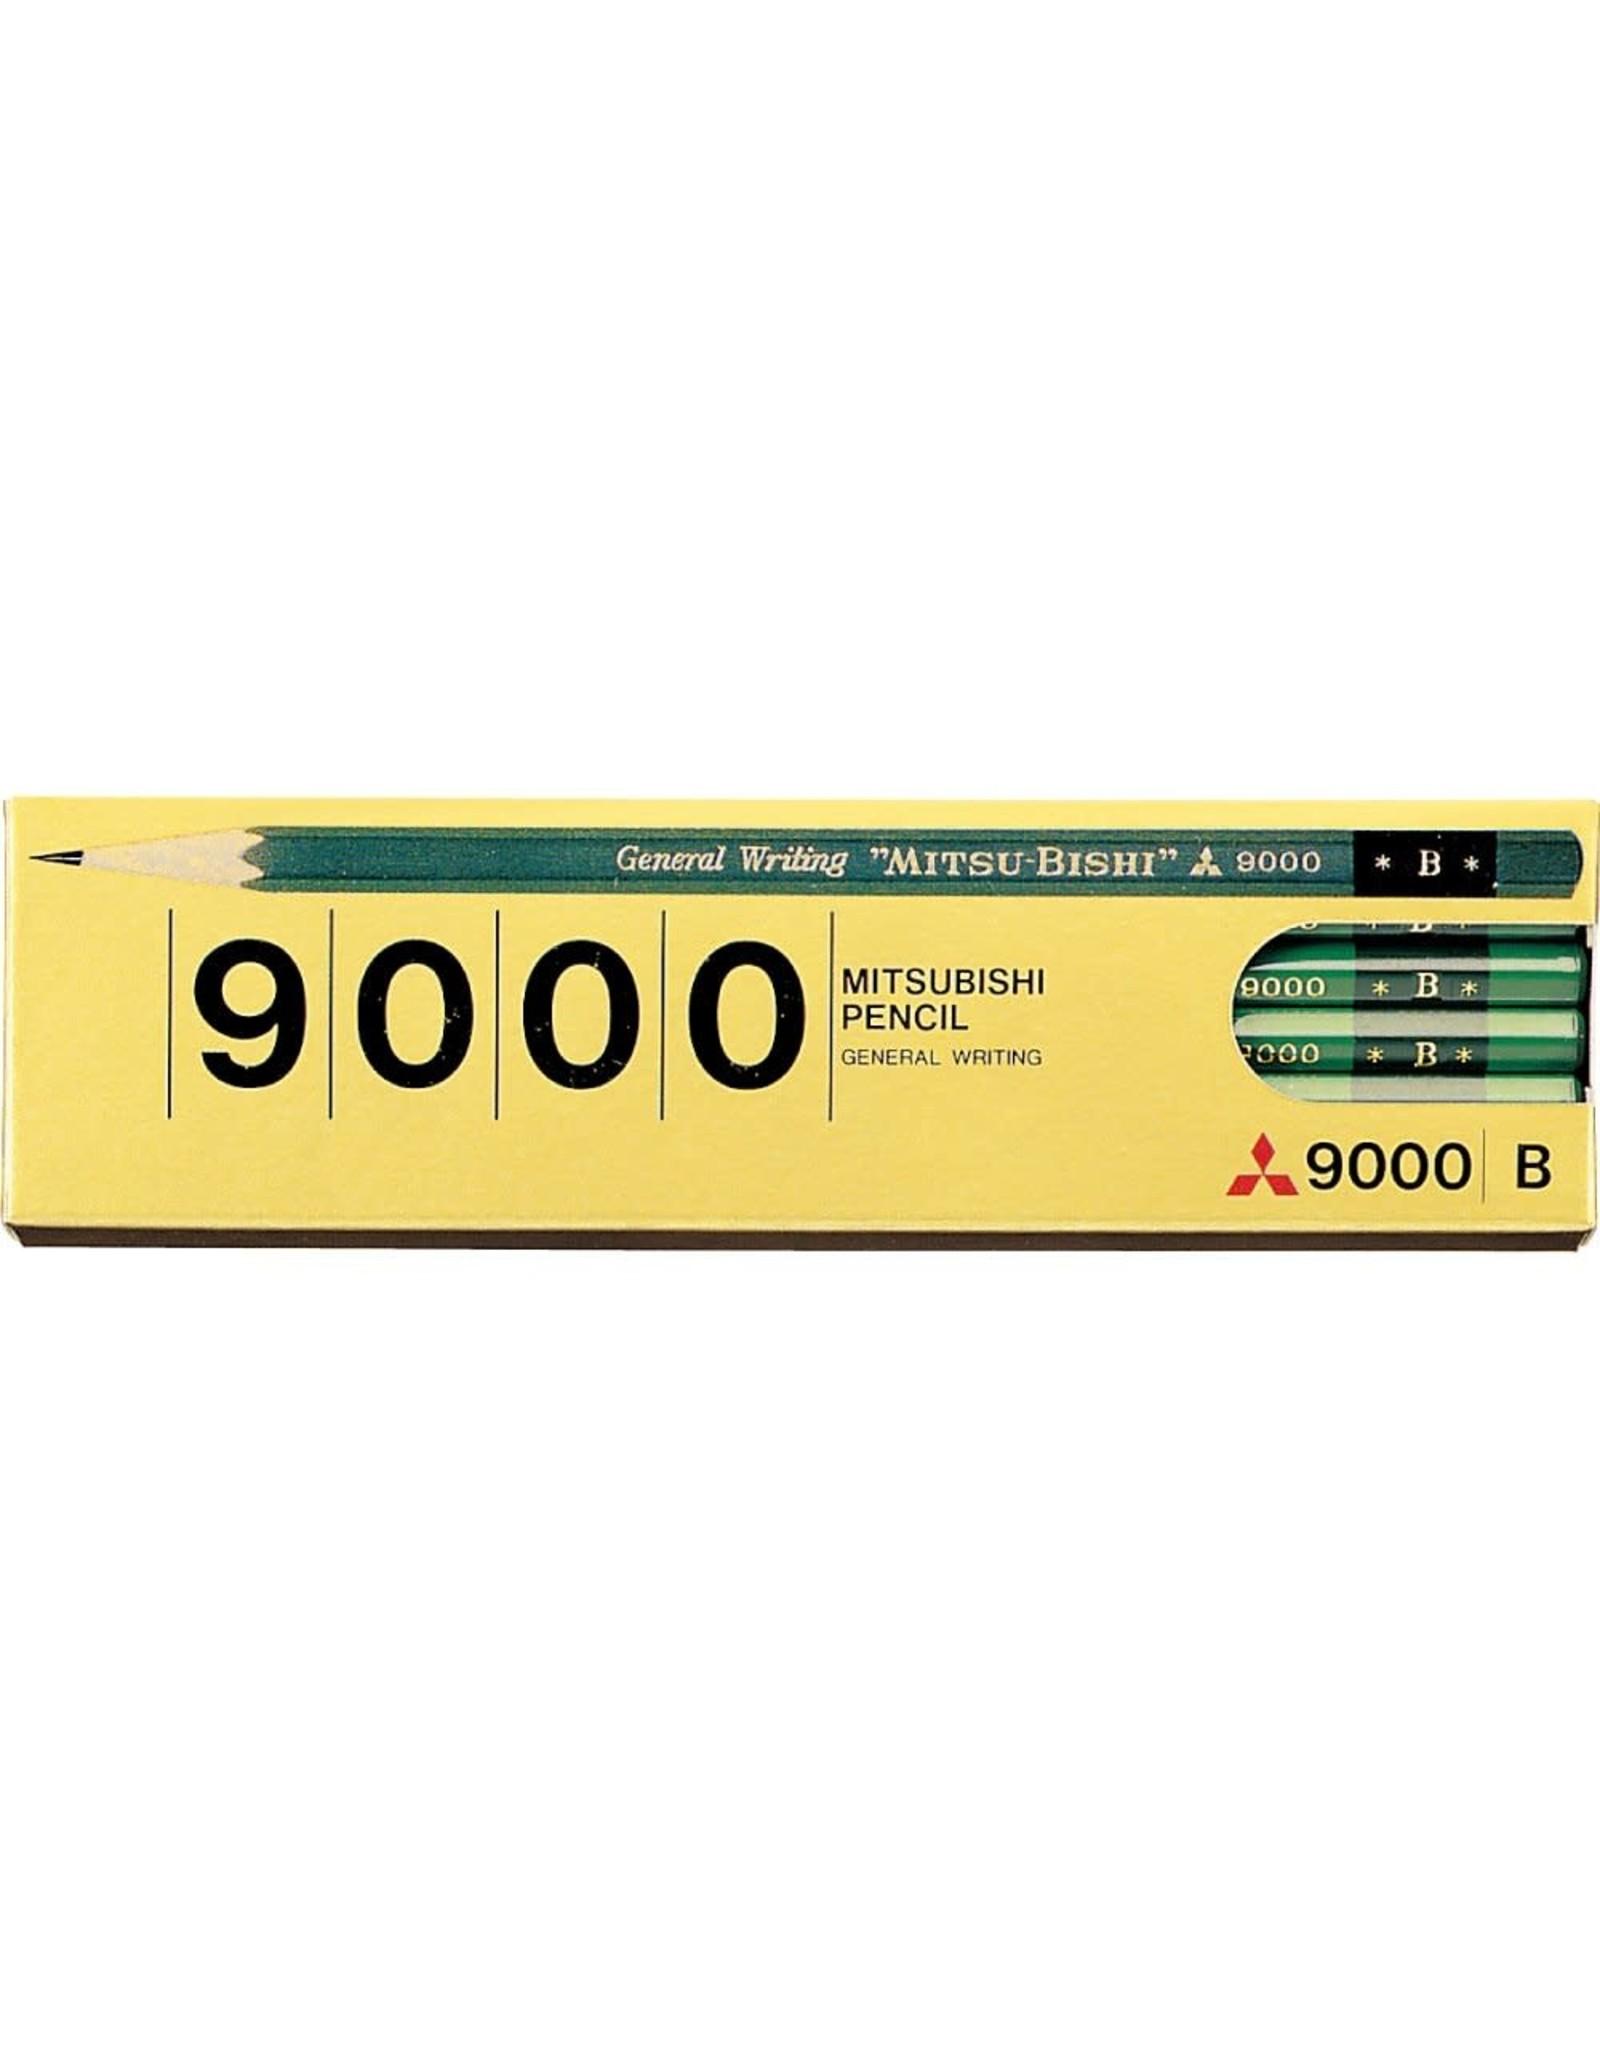 Mitsubishi Pencil Co., Ltd. GENERAL WRITING ''MITSU-BISHI'' 9000 B 12 PCS SET